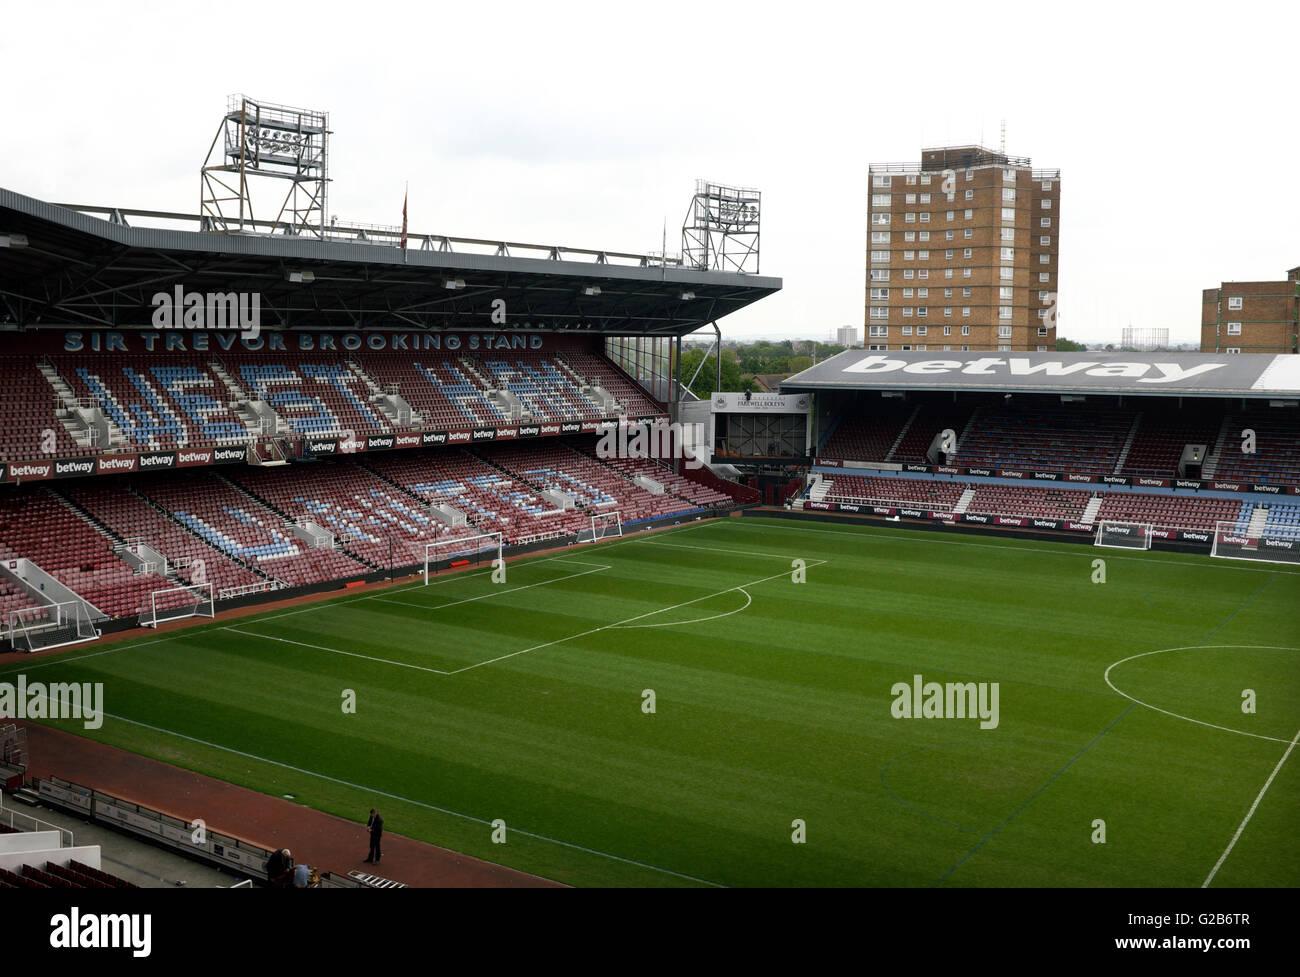 Sir Trevor Brooking Stand, The Boleyn Ground, Upton Park ...